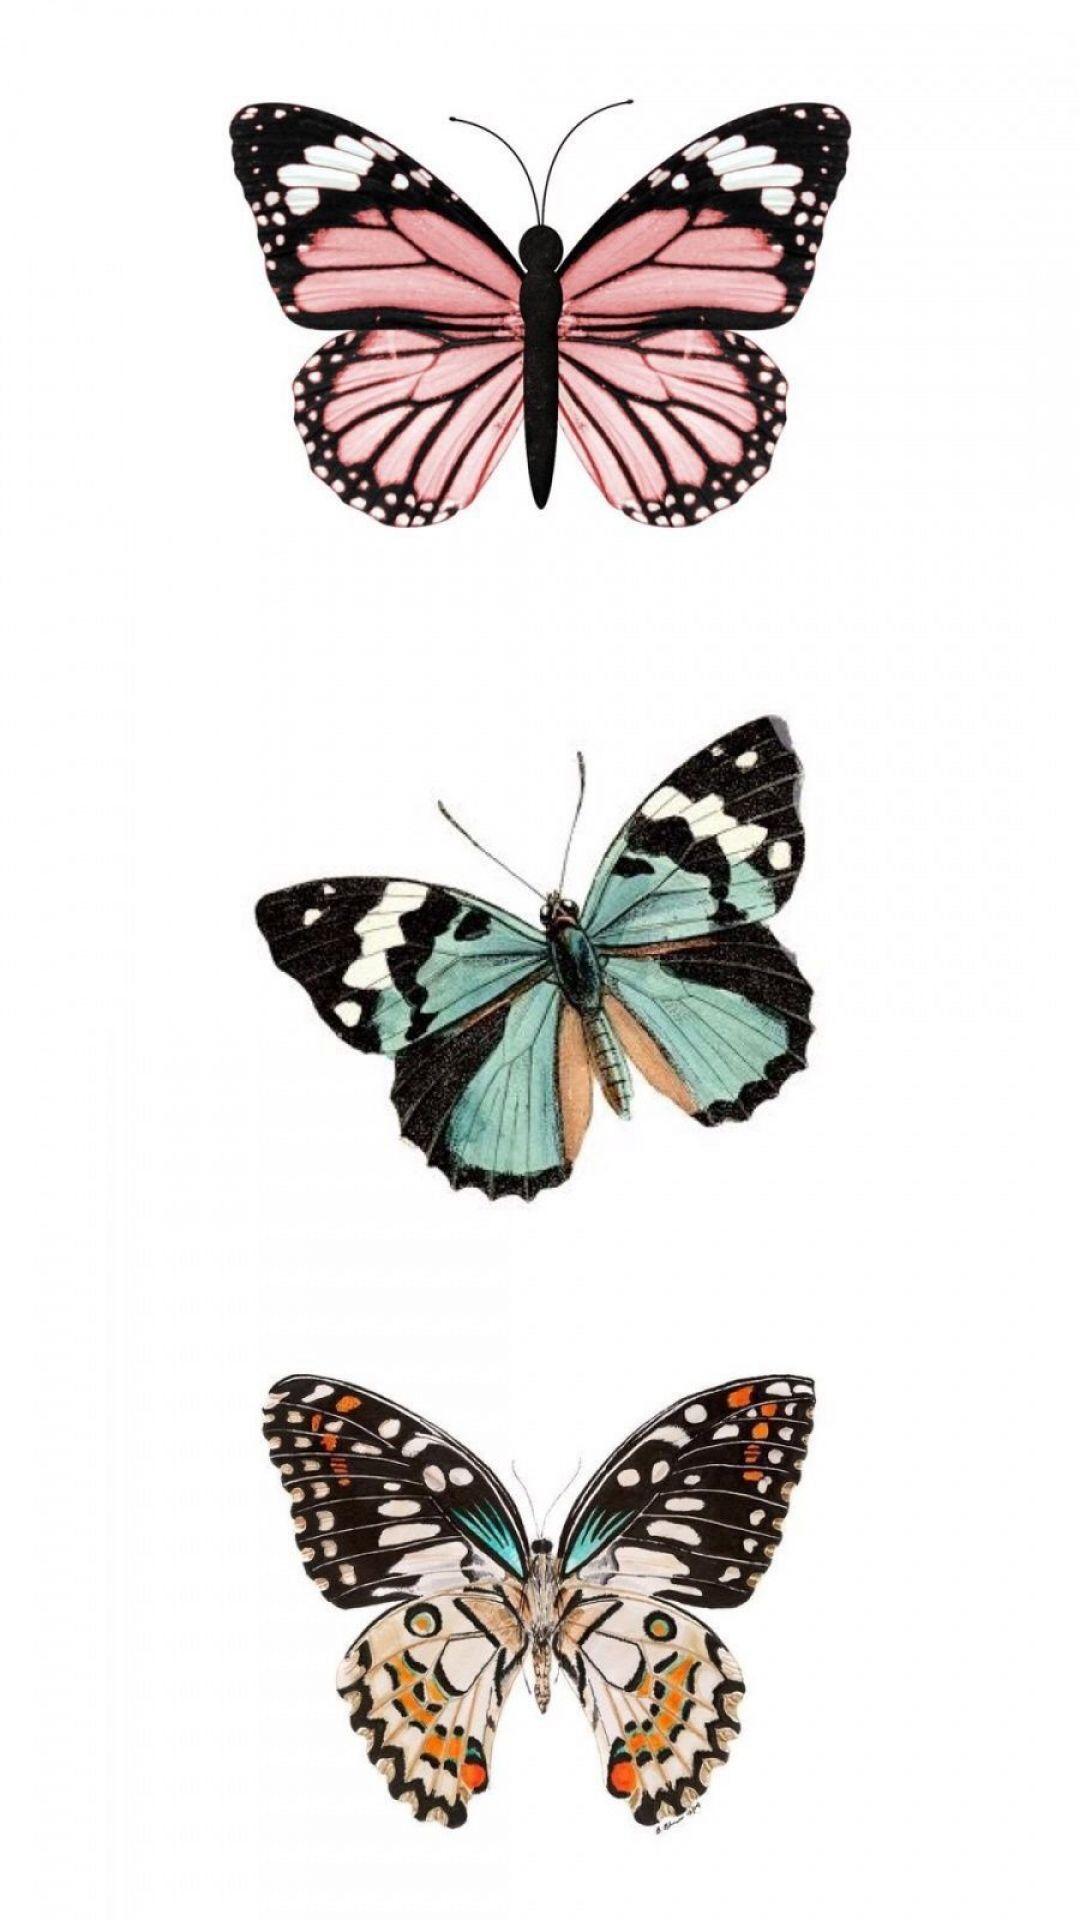 Aesthetic butterfly wallpaper mobile flip wallpapers